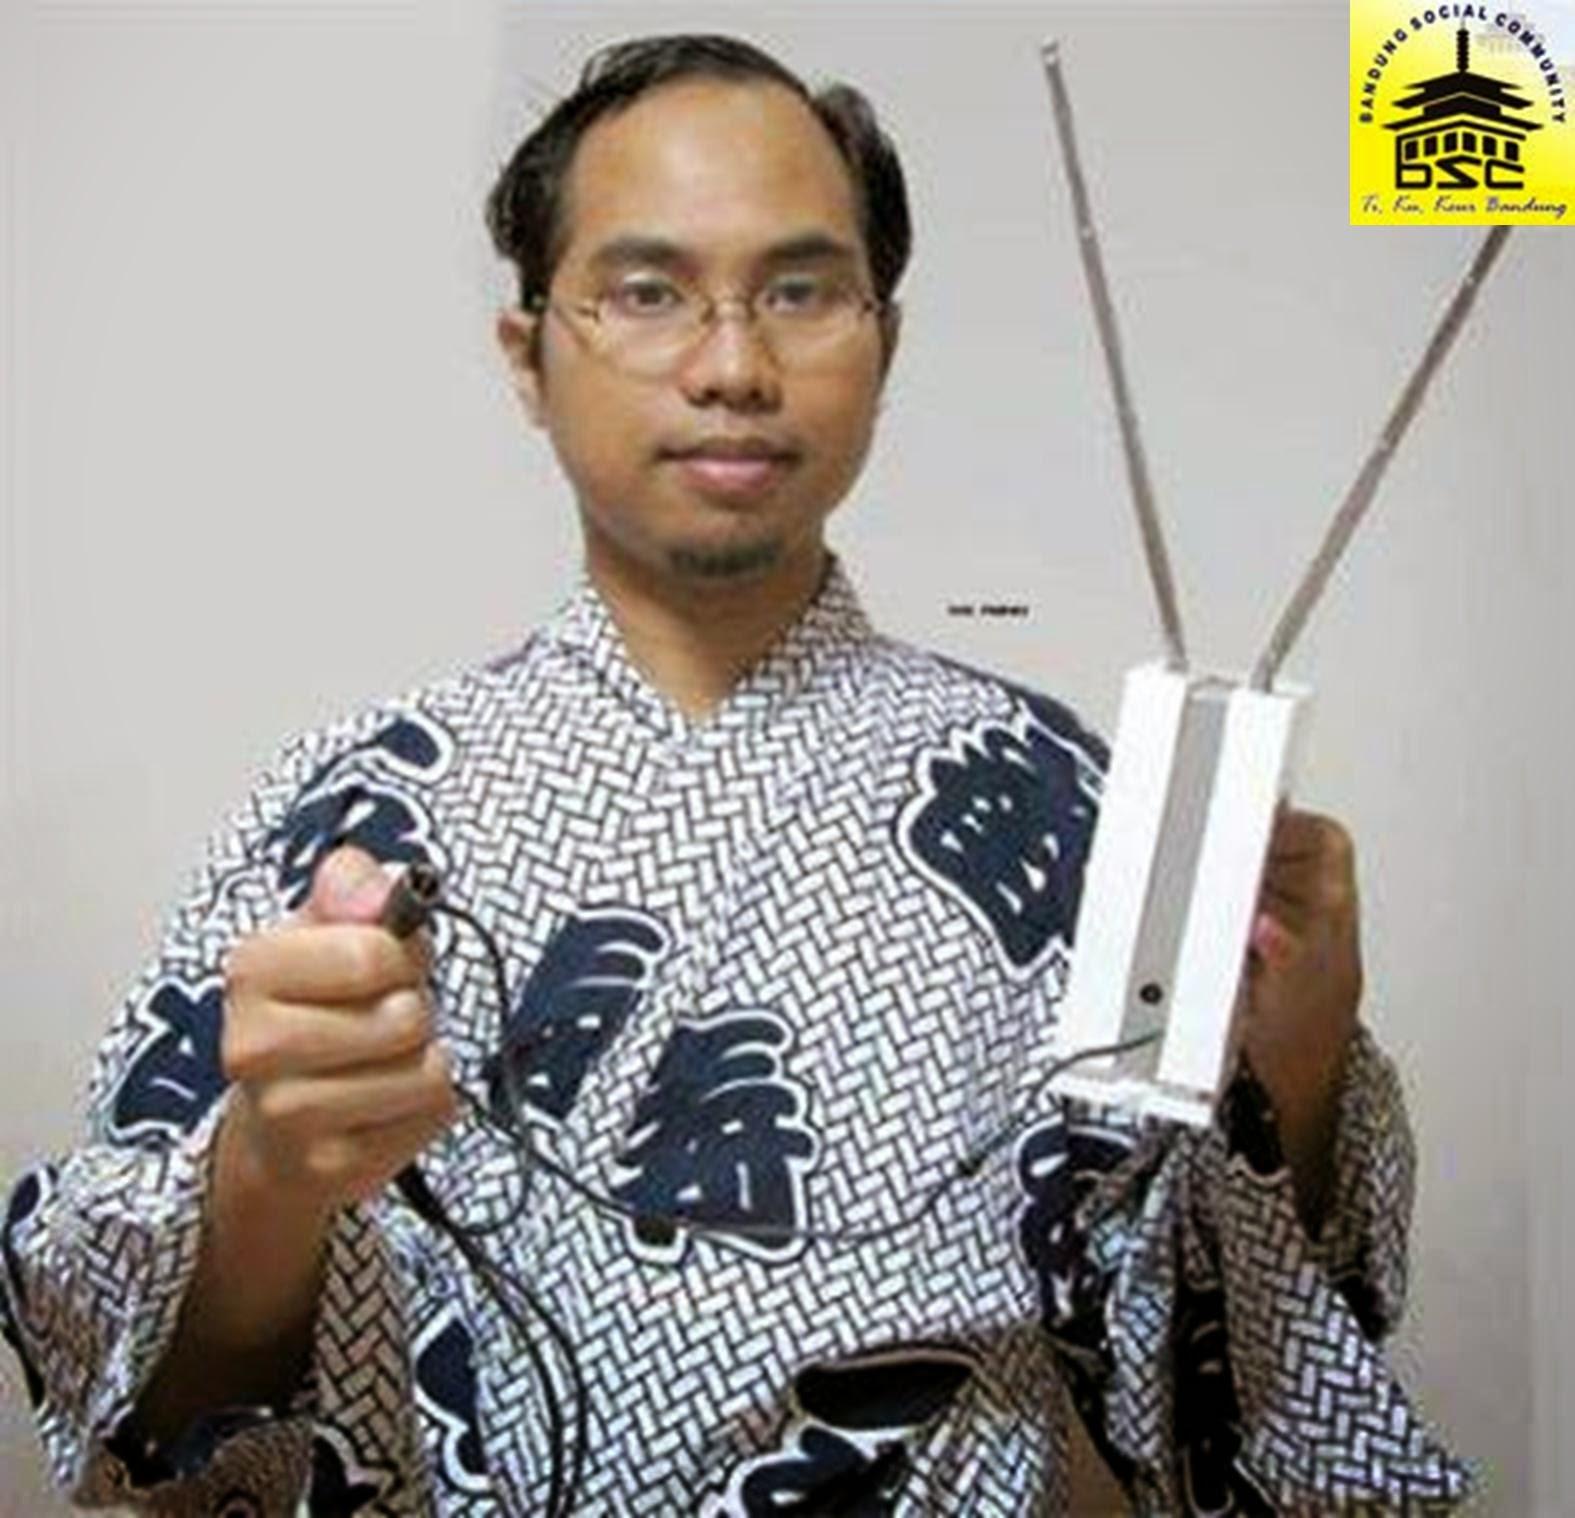 Khoirul Anwar.., Pemilik Patent 4G ternyata orang Indonesia....!!! - http://indonesiatanahairku-indonesia.blogspot.com/